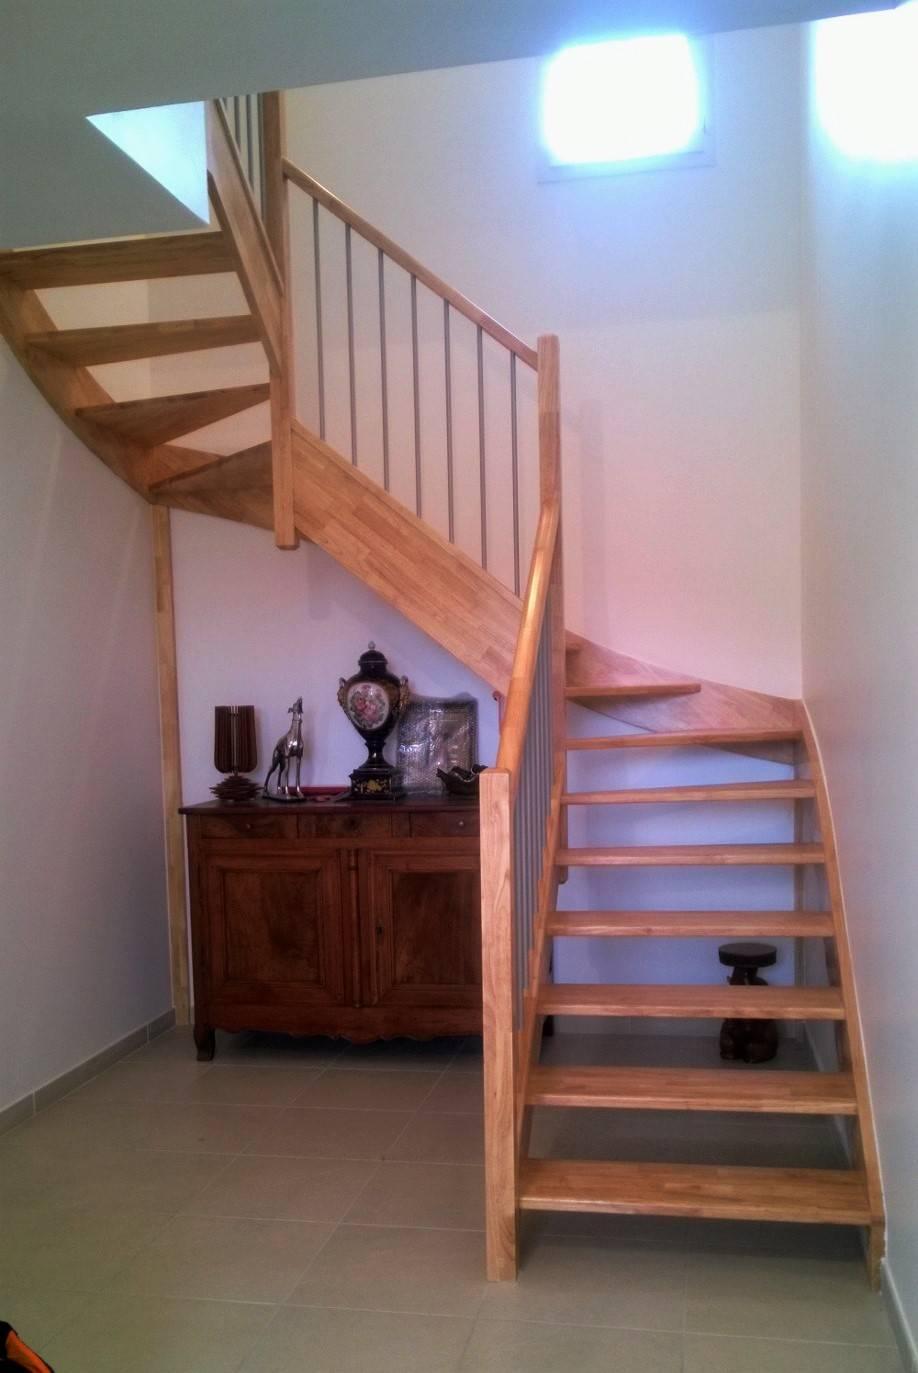 escalier 2 4 tournants sans contremarche en h v a. Black Bedroom Furniture Sets. Home Design Ideas